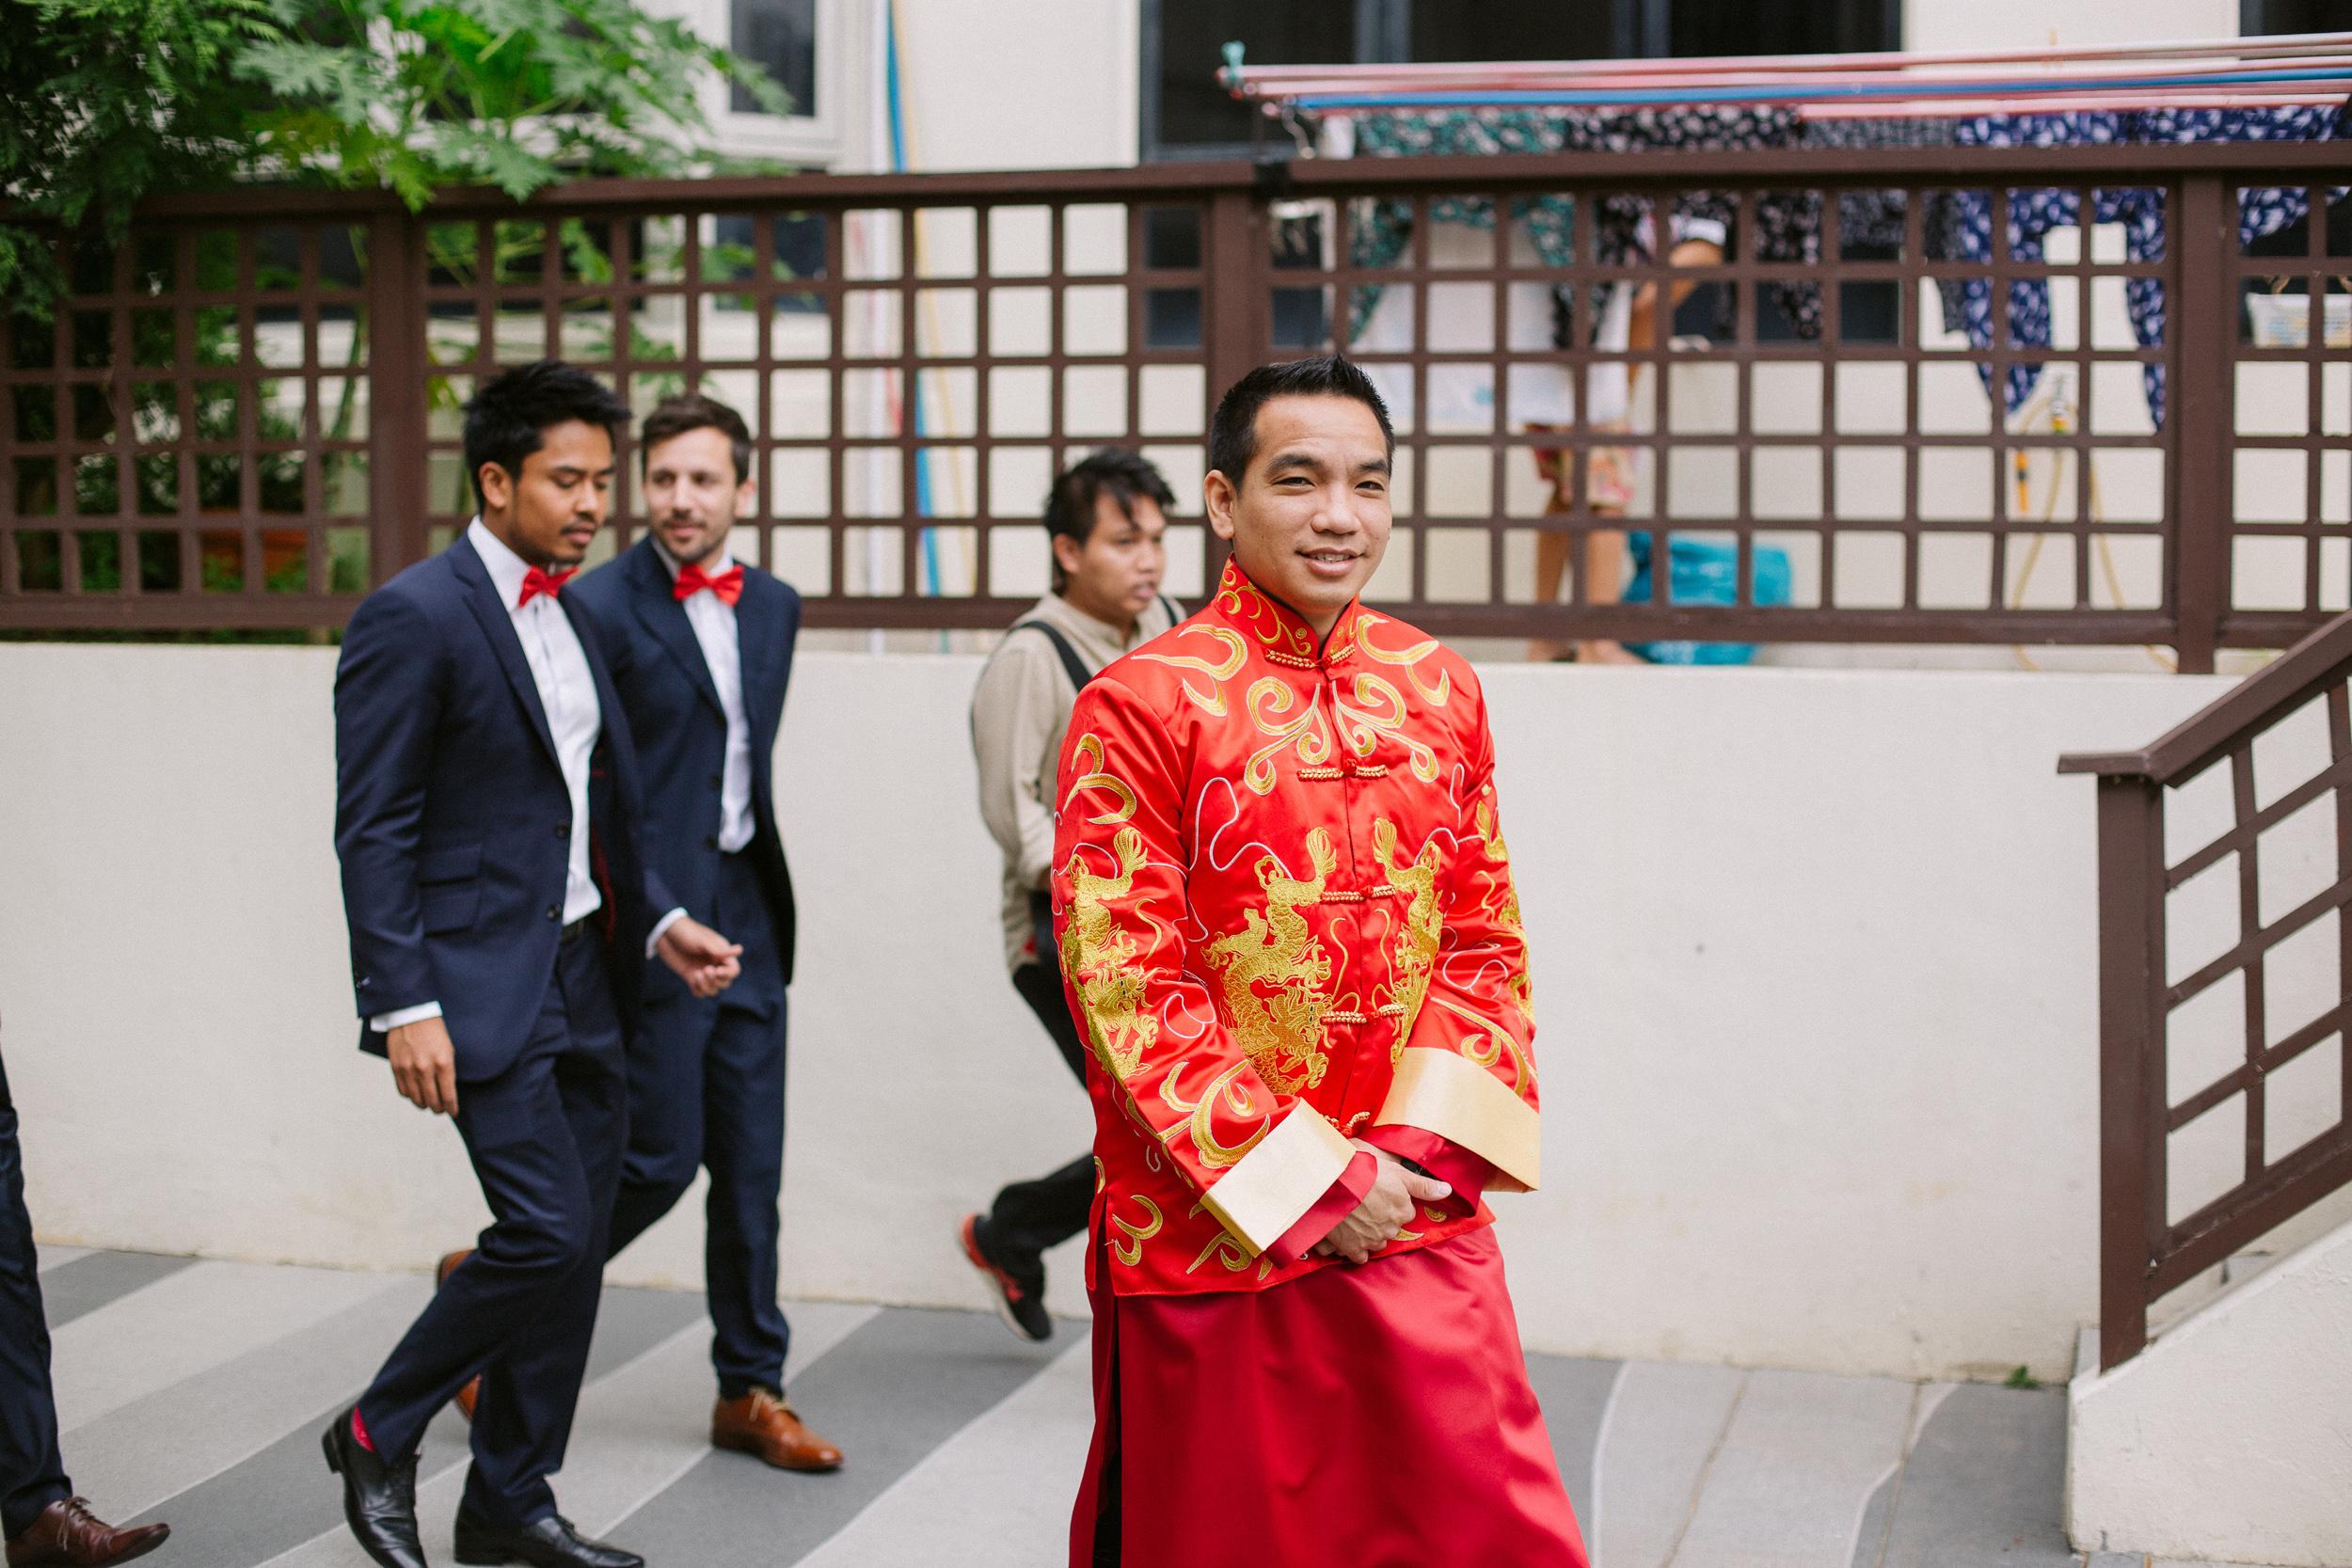 singapore-wedding-photographer-cheryl-matthew-fullerton-hotel-wedding-04.jpg